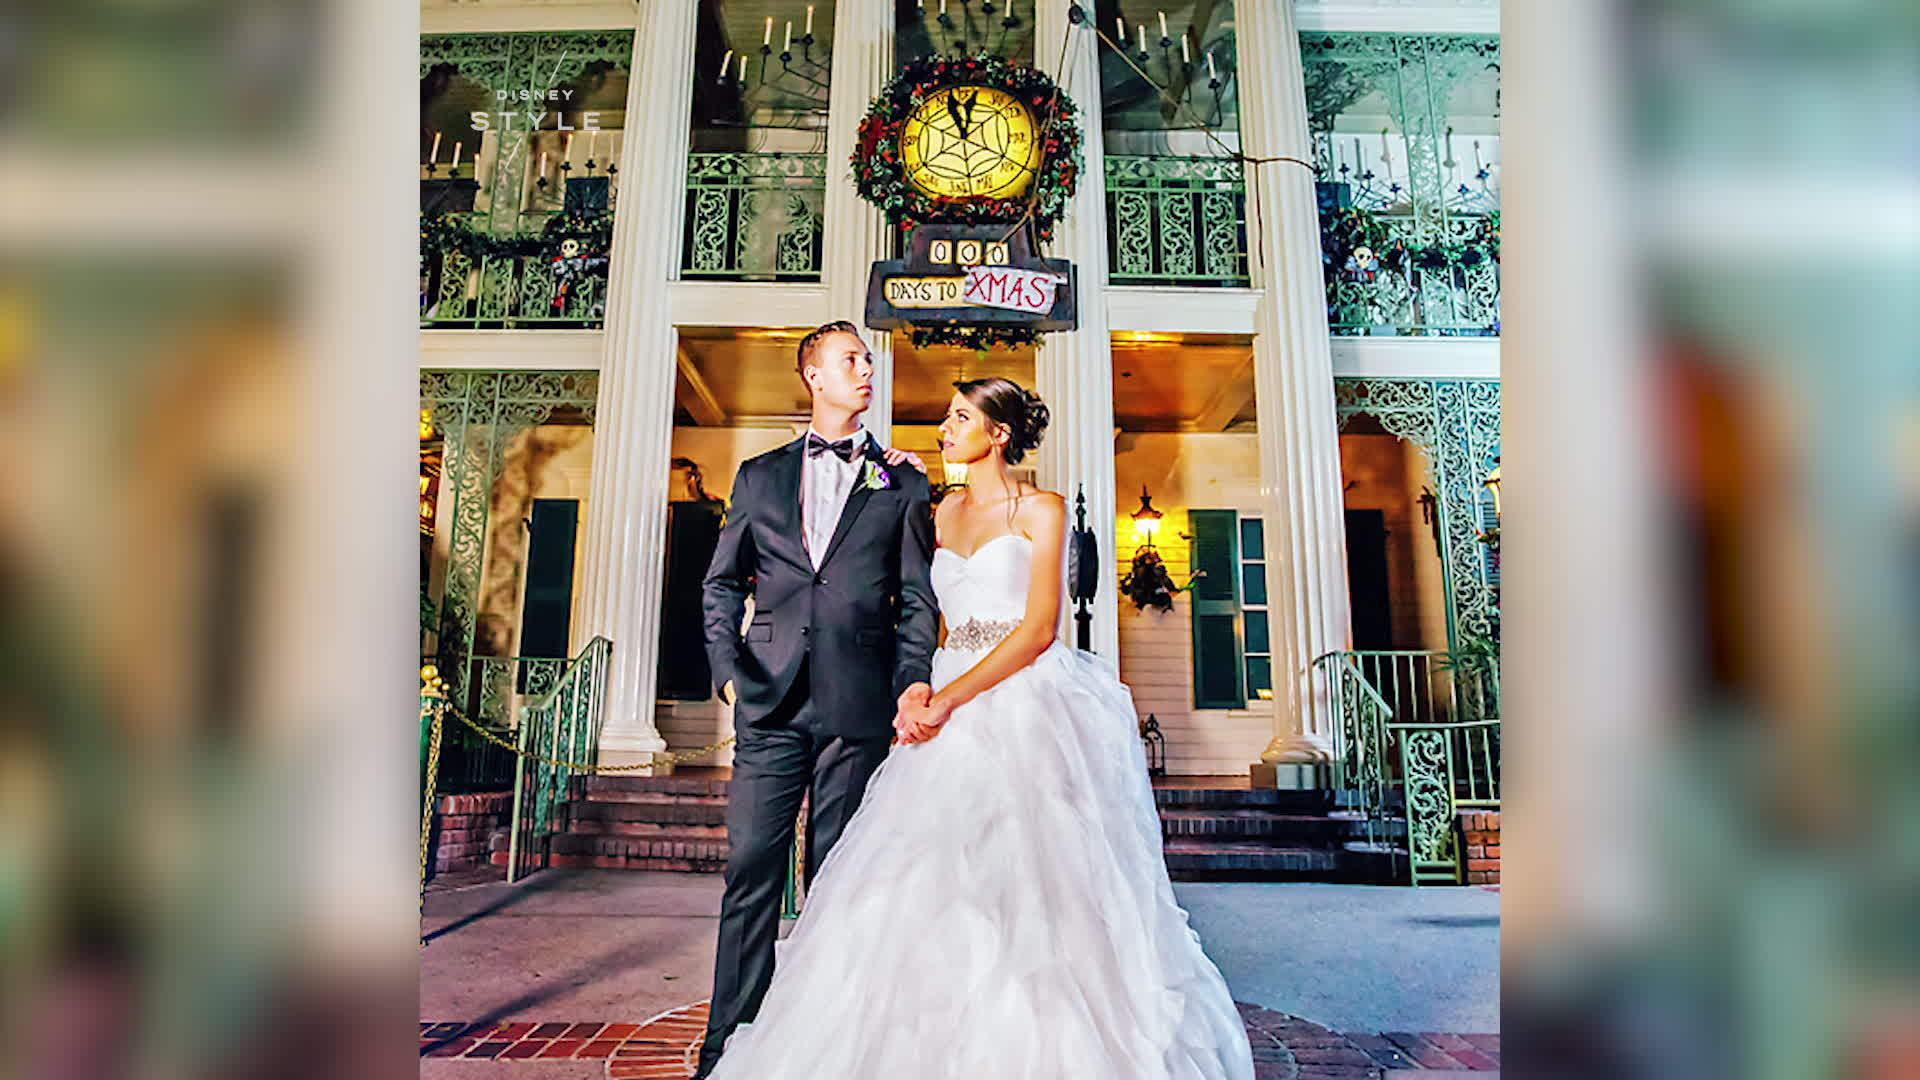 6 Ways to Incorporate Disney Into Your Wedding Day   Disney Style